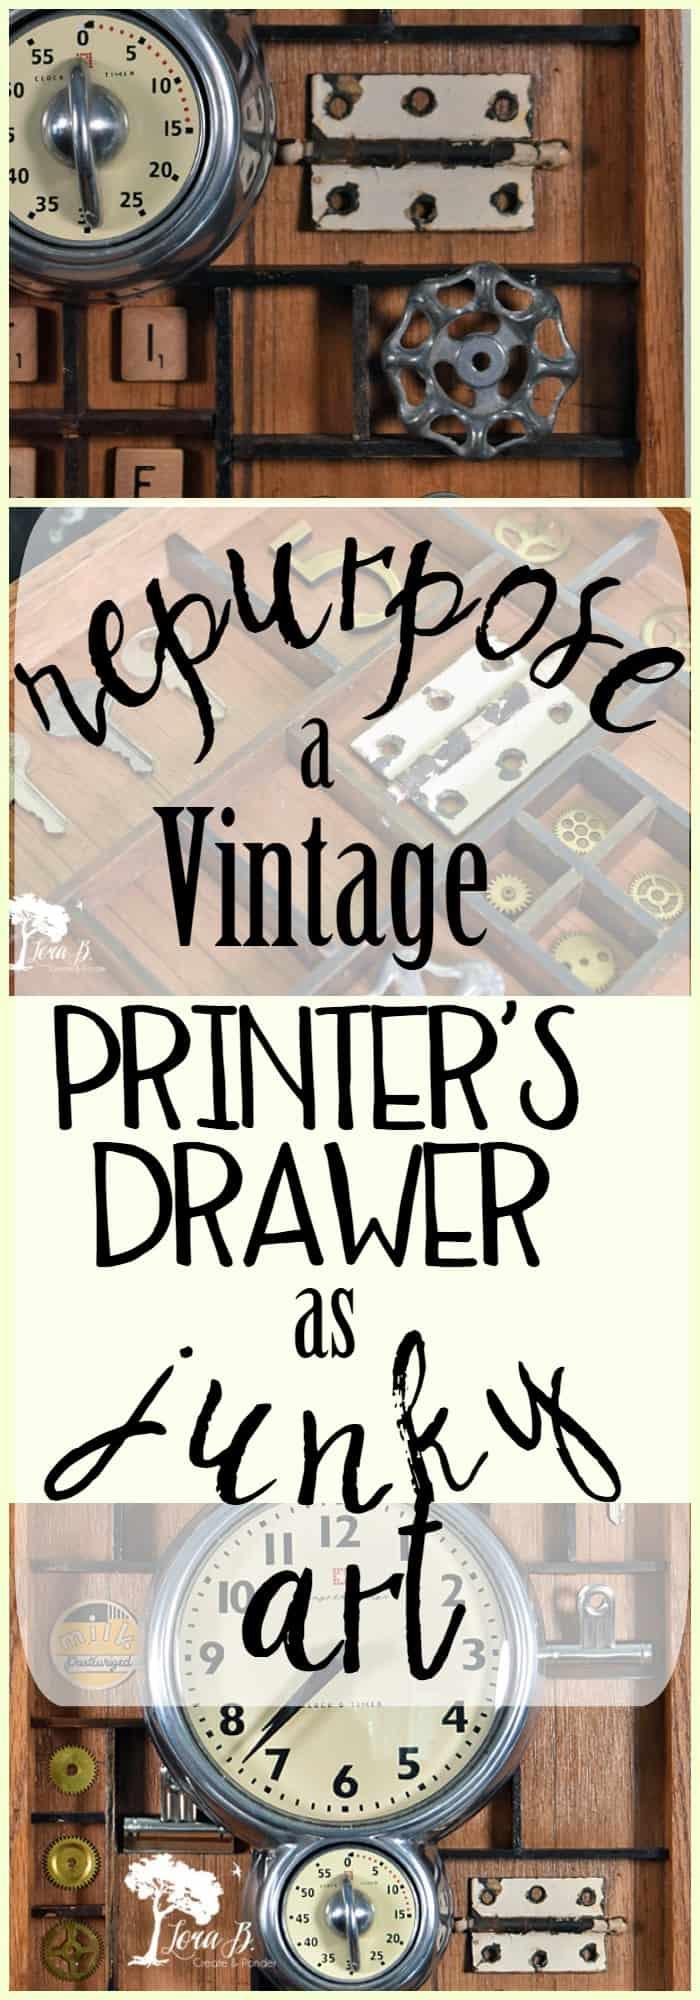 Repurpose a Vintage Printer's Drawer as Junky Art